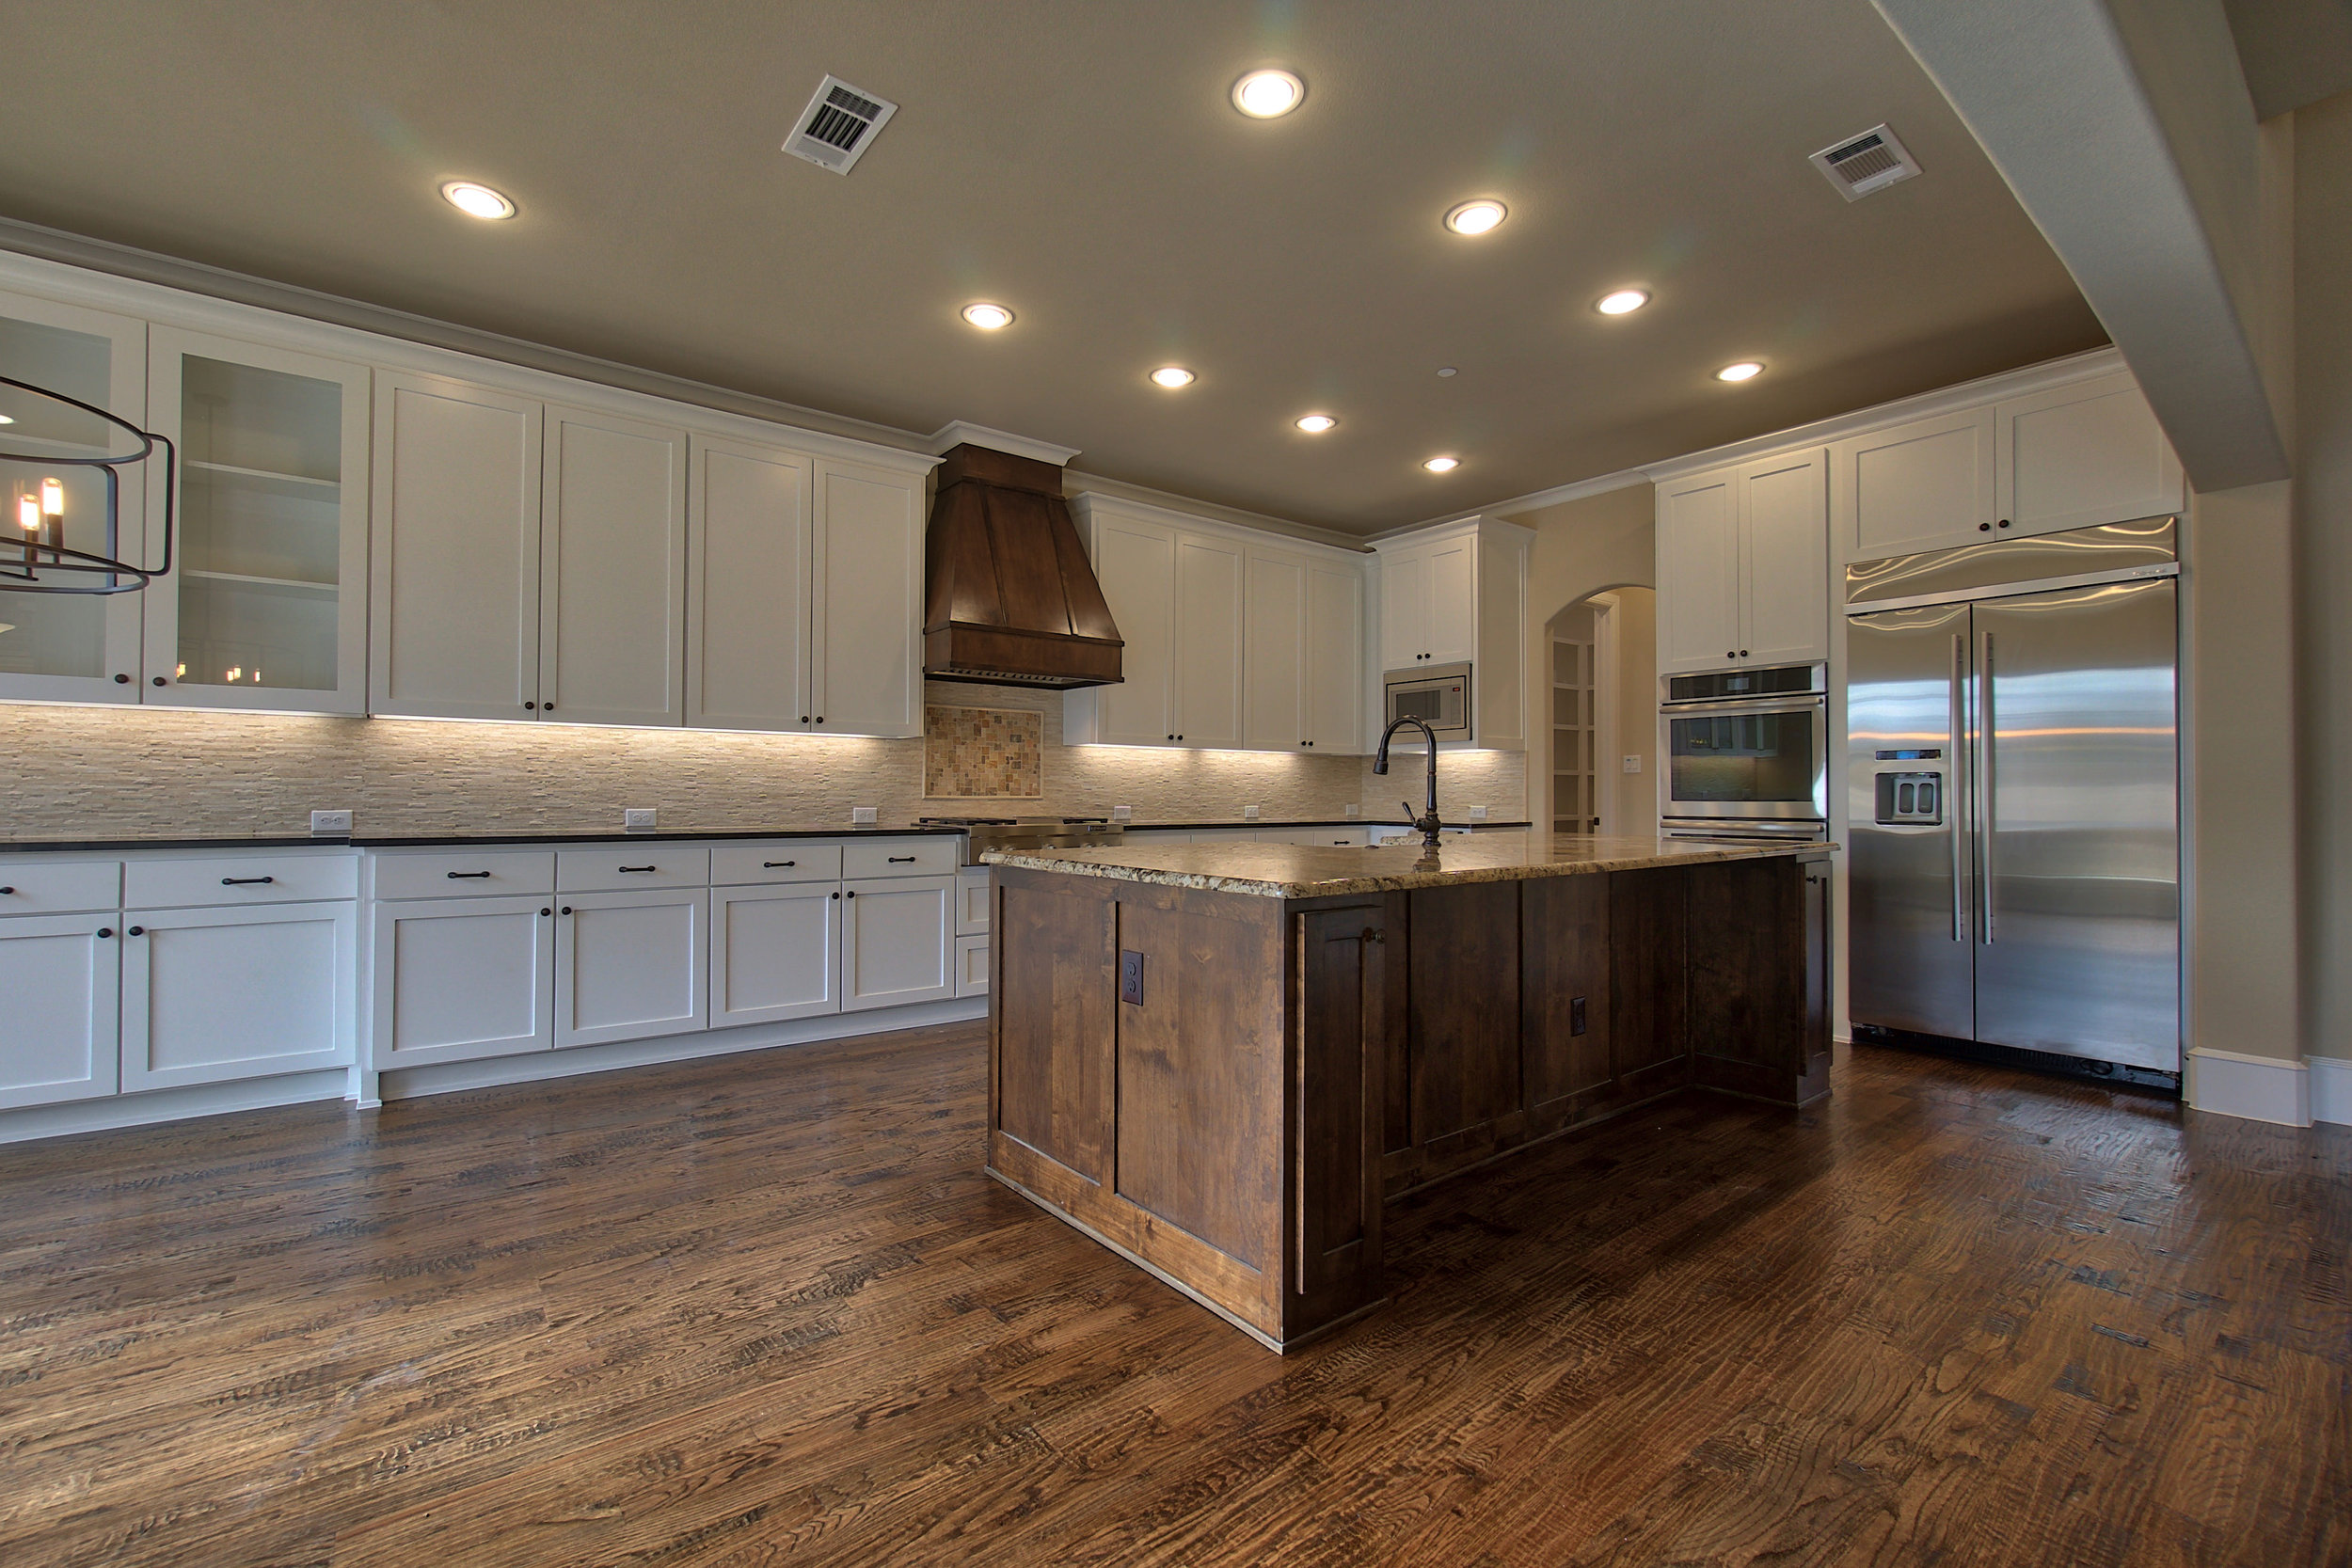 14 kitchen 1.jpeg